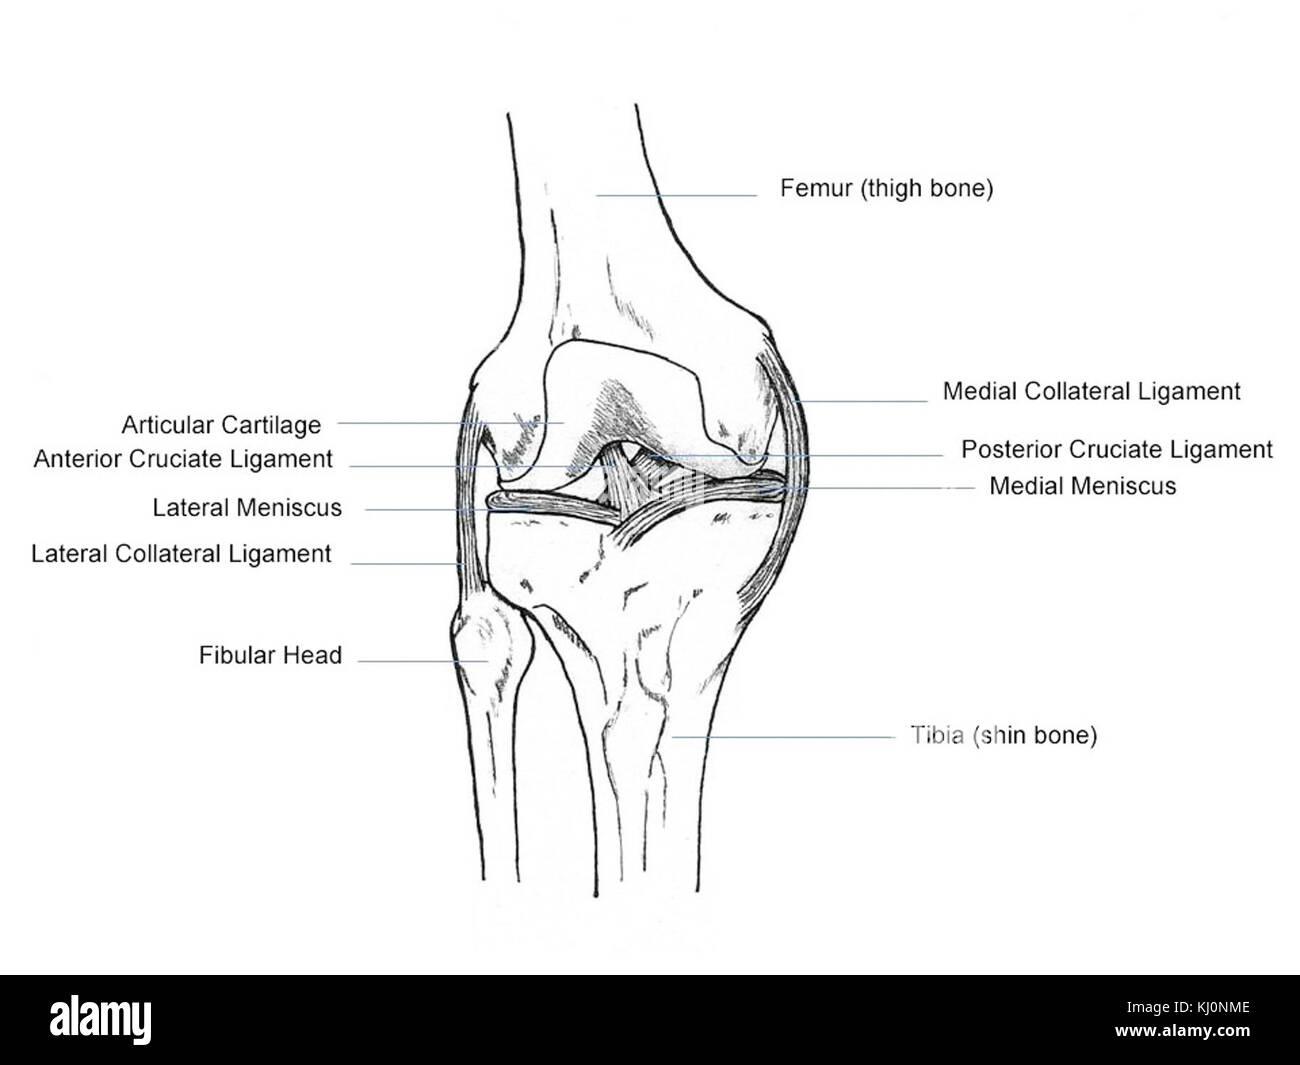 Knee Anatomy Stockfotos & Knee Anatomy Bilder - Alamy